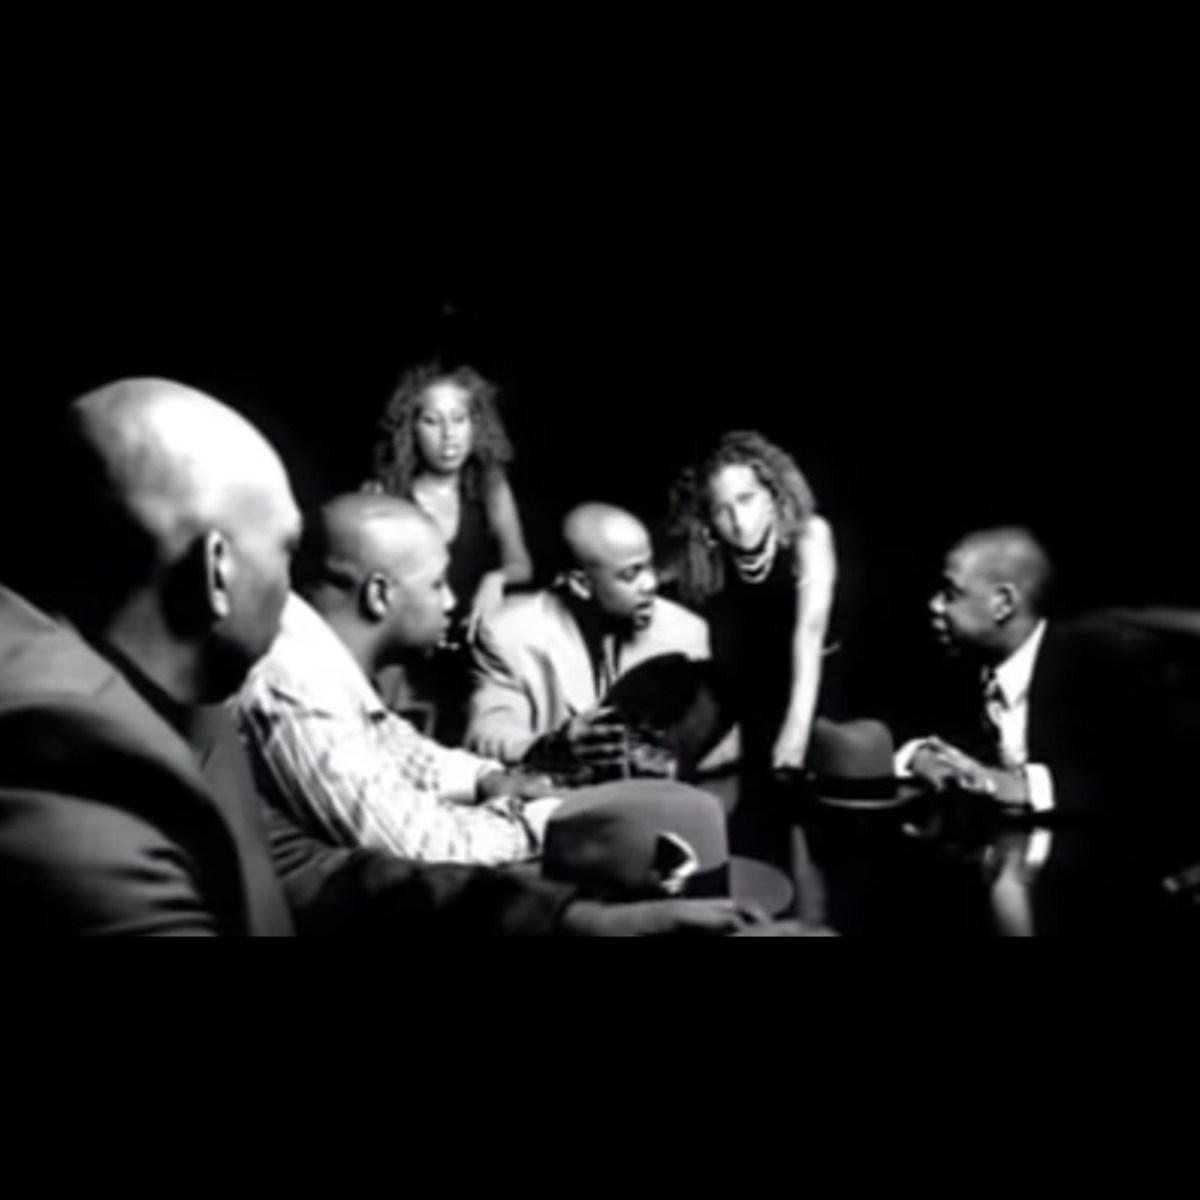 Jay-Z - Can't Knock The Hustle (ft. Mary J. Blige) (Thumbnail)